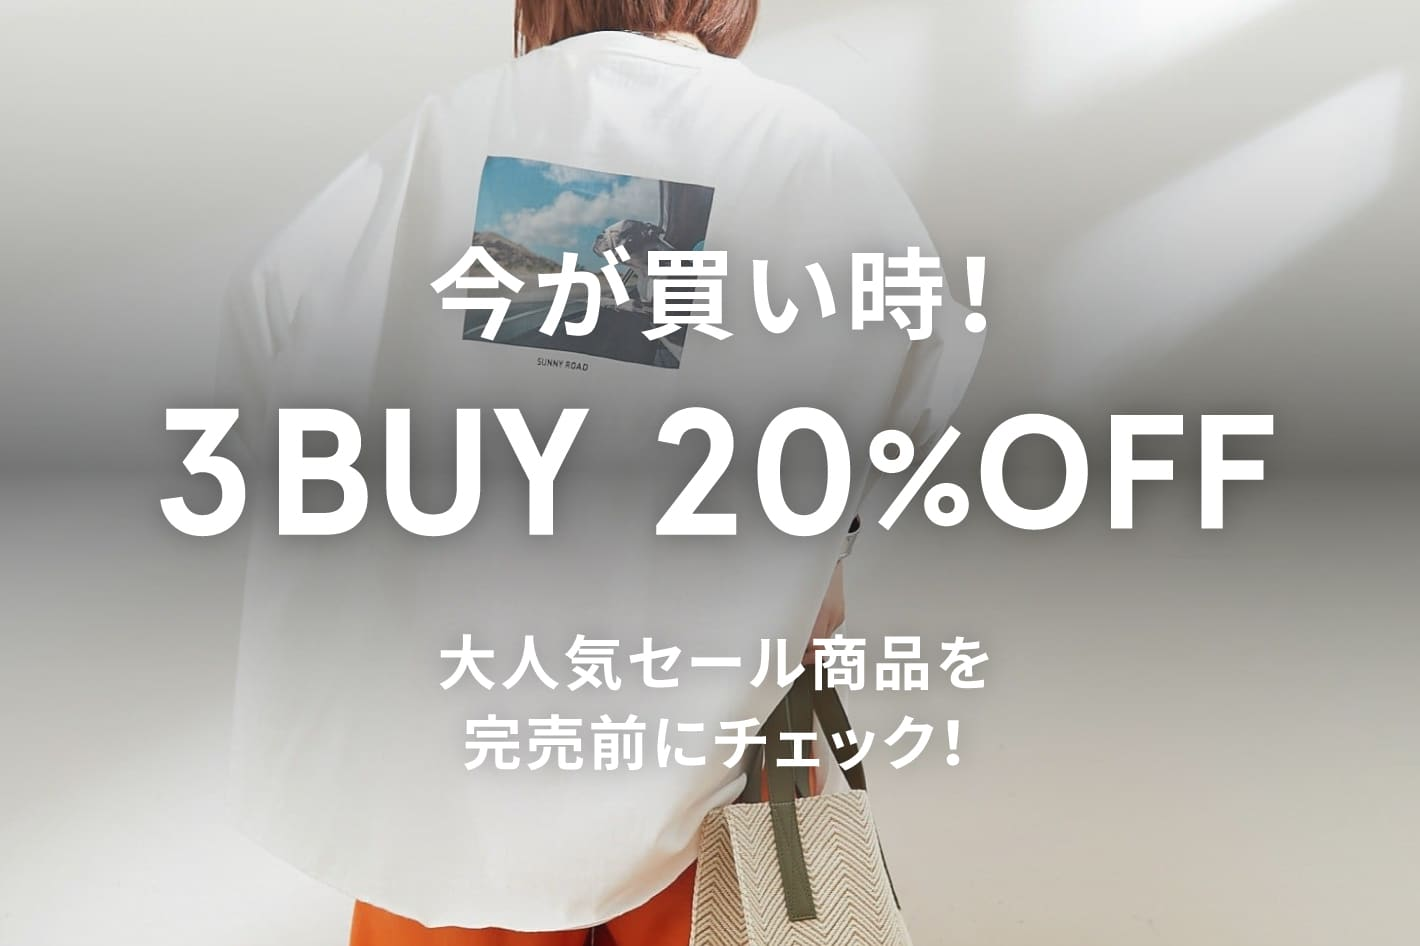 CIAOPANIC TYPY 【3BUY20%OFF】今が買い時‼おすすめアイテム